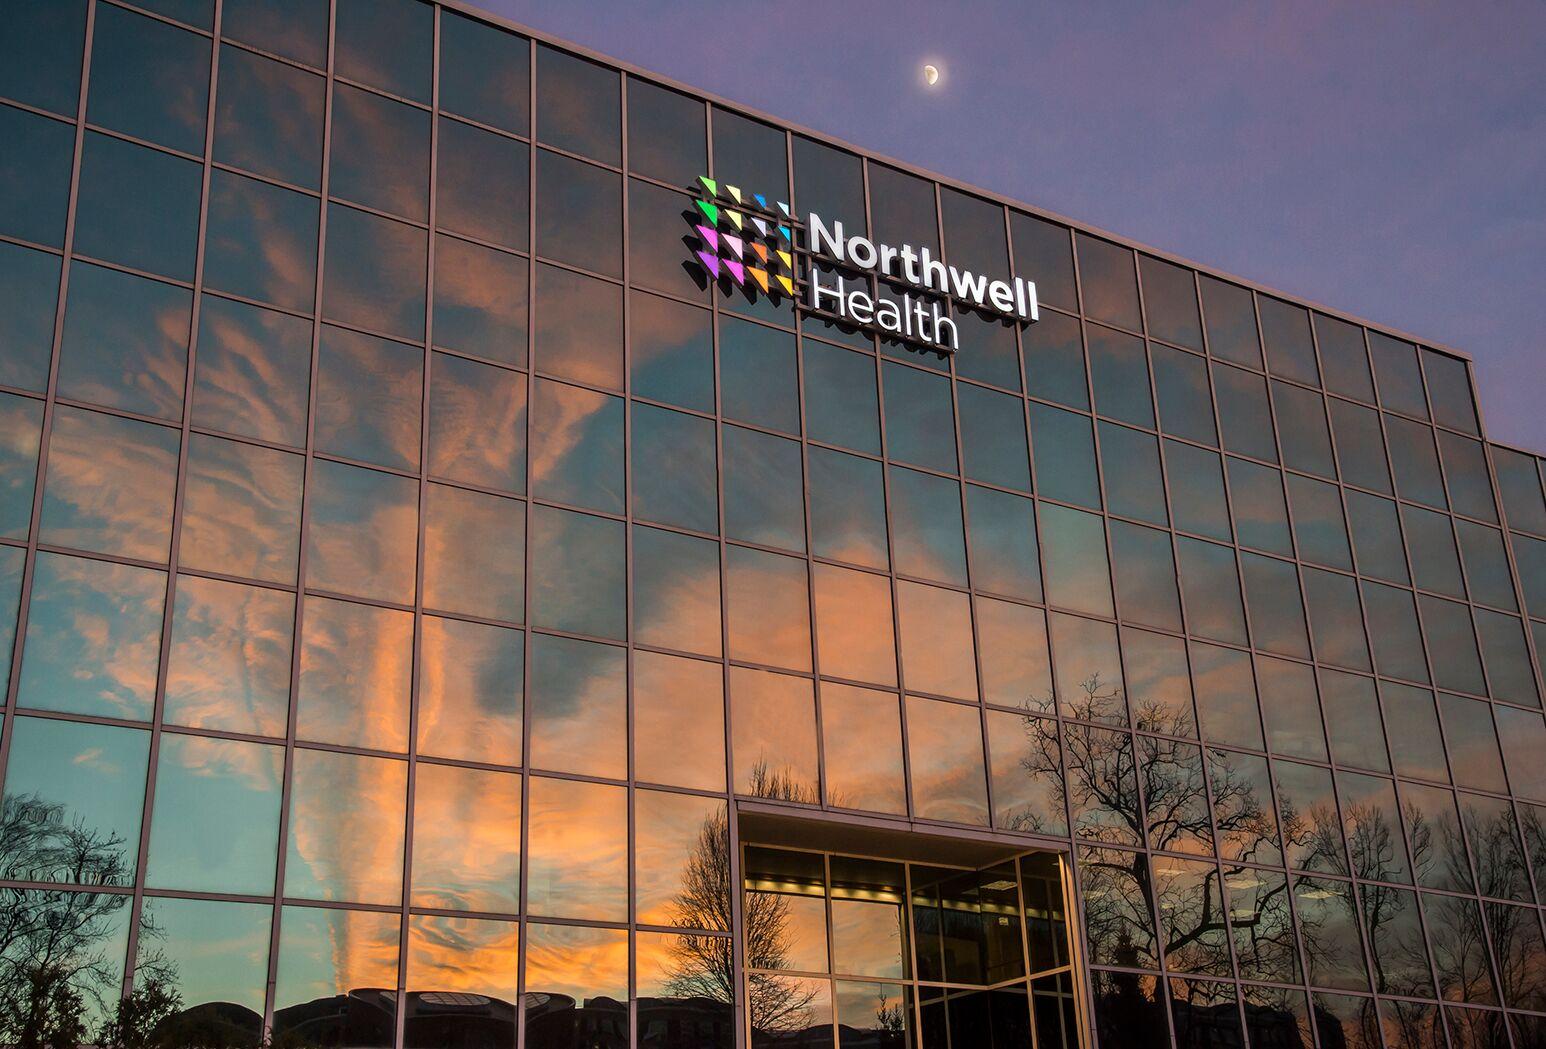 Northwell Health.